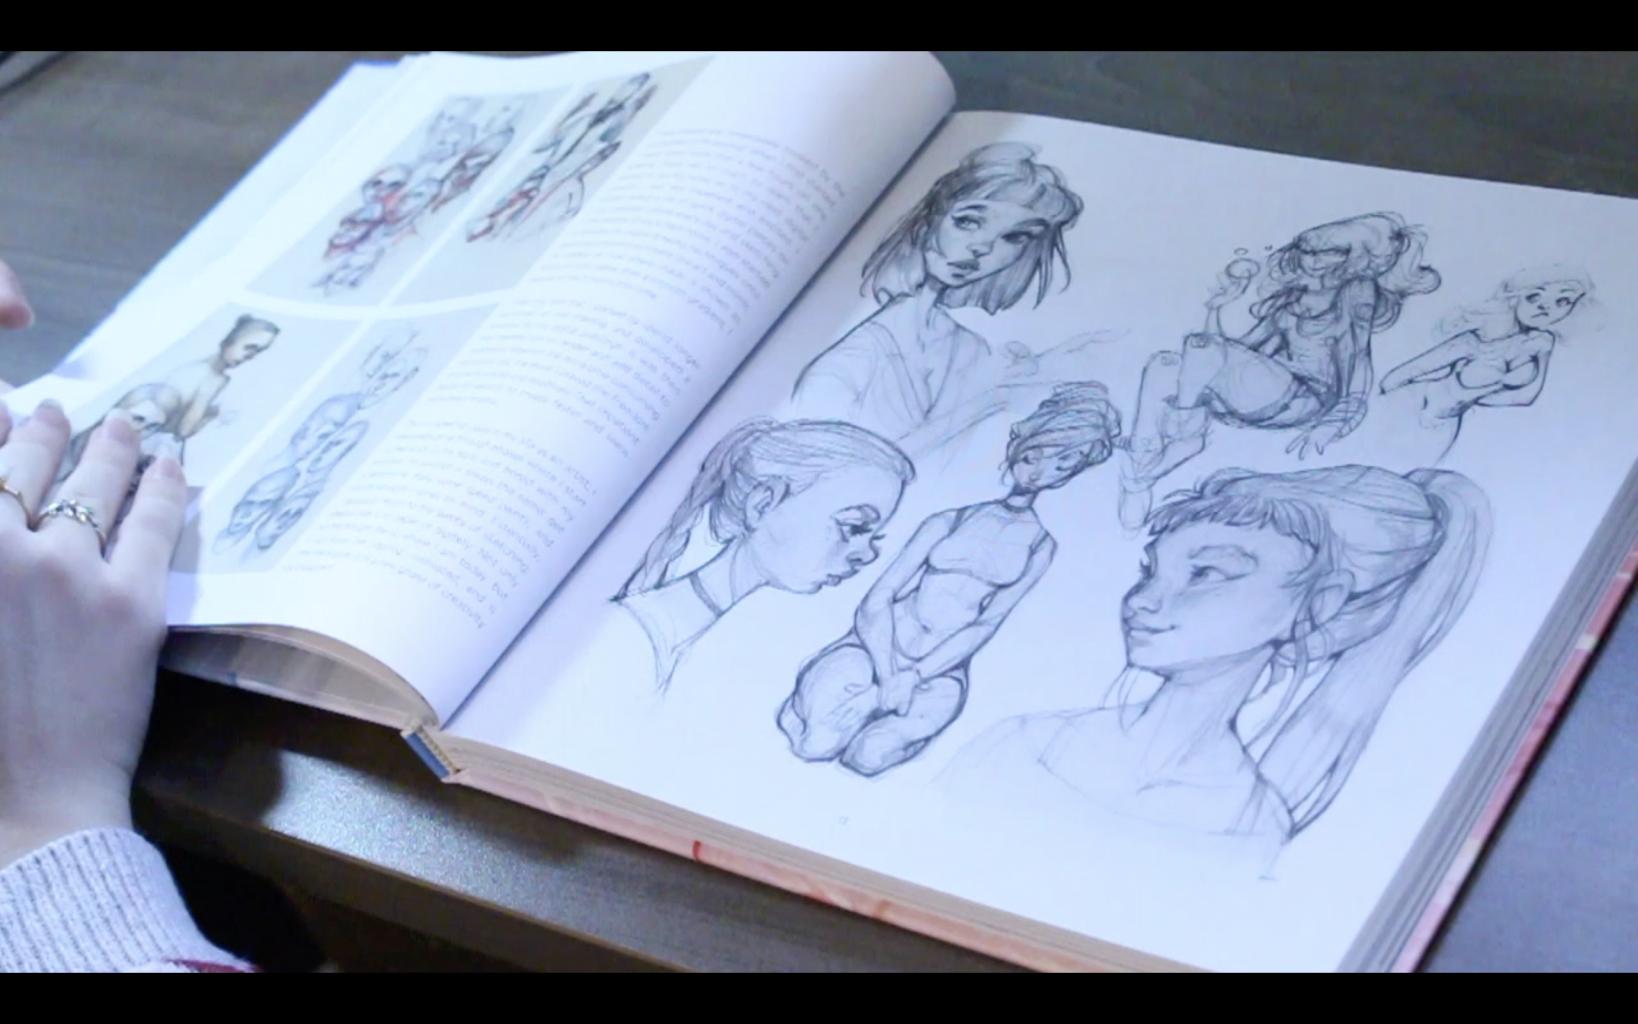 The Sketchbook Of Loish: Art In Progress (+Video Unboxing And Flip Through) Inside My Sketchbook